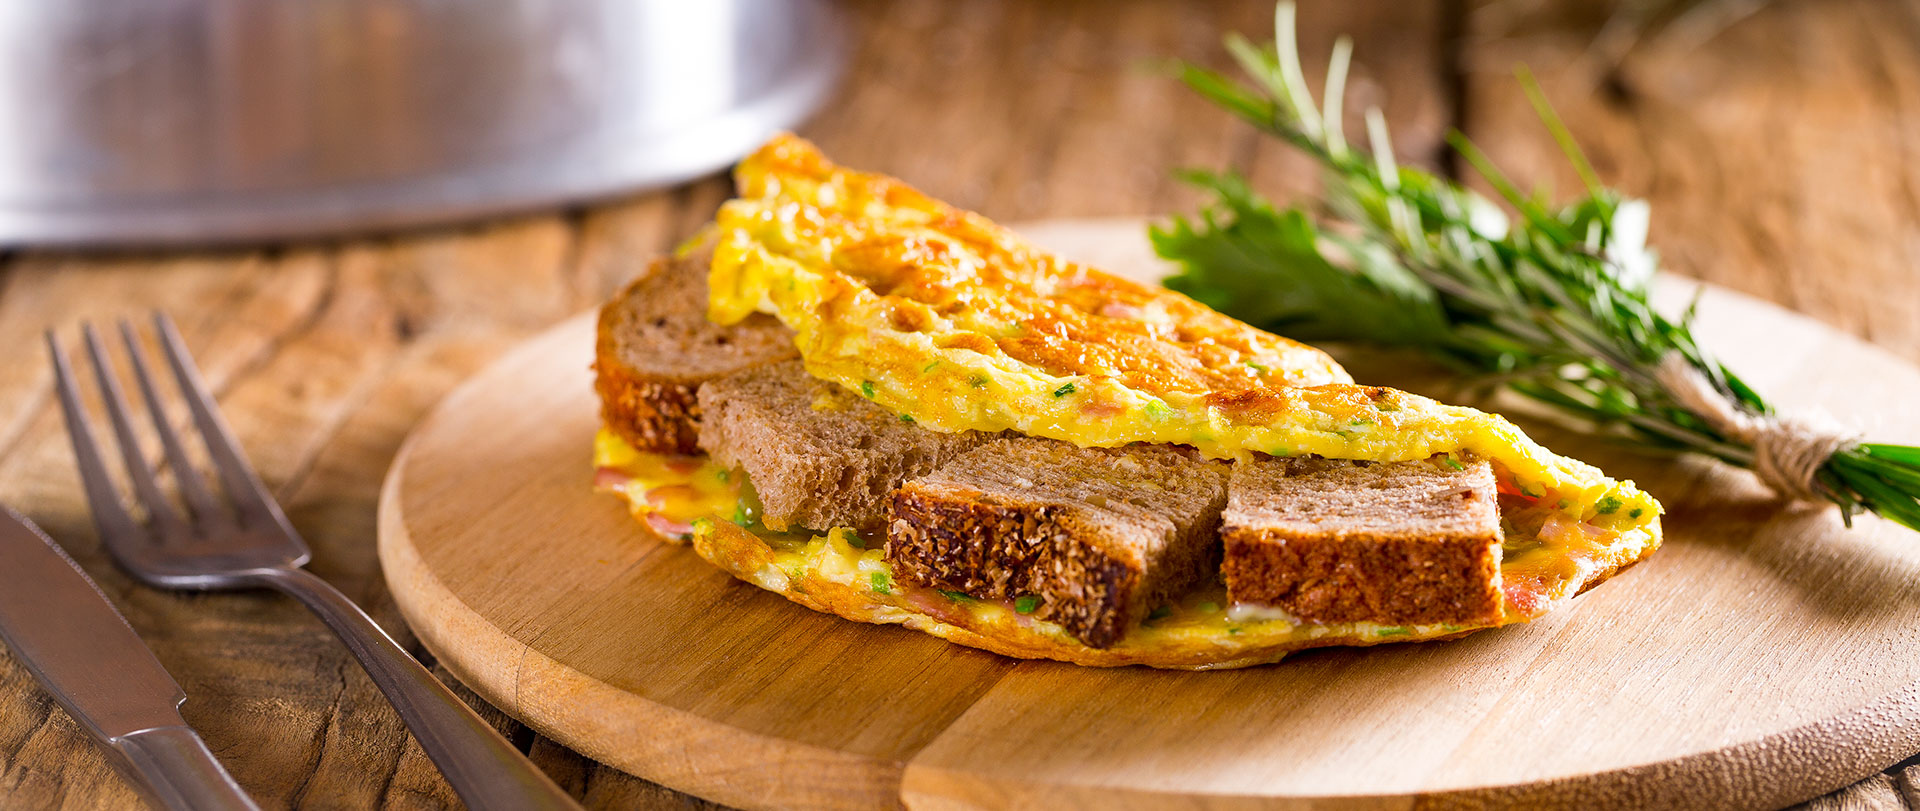 Sanduíche invertido com omelete